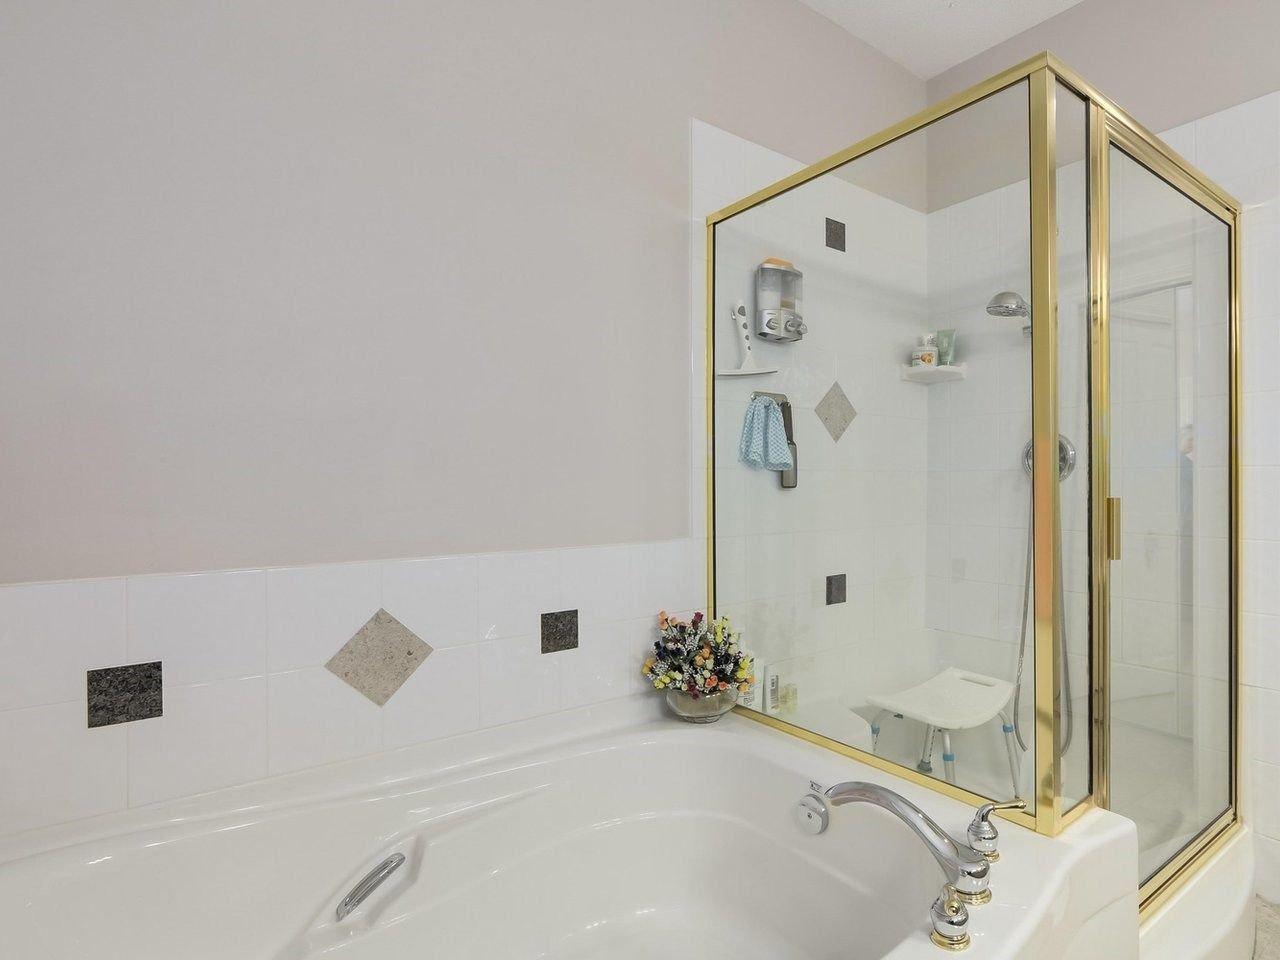 Photo 13: Photos: 303 3280 PLATEAU BOULEVARD in Coquitlam: Westwood Plateau Condo for sale : MLS®# R2275918